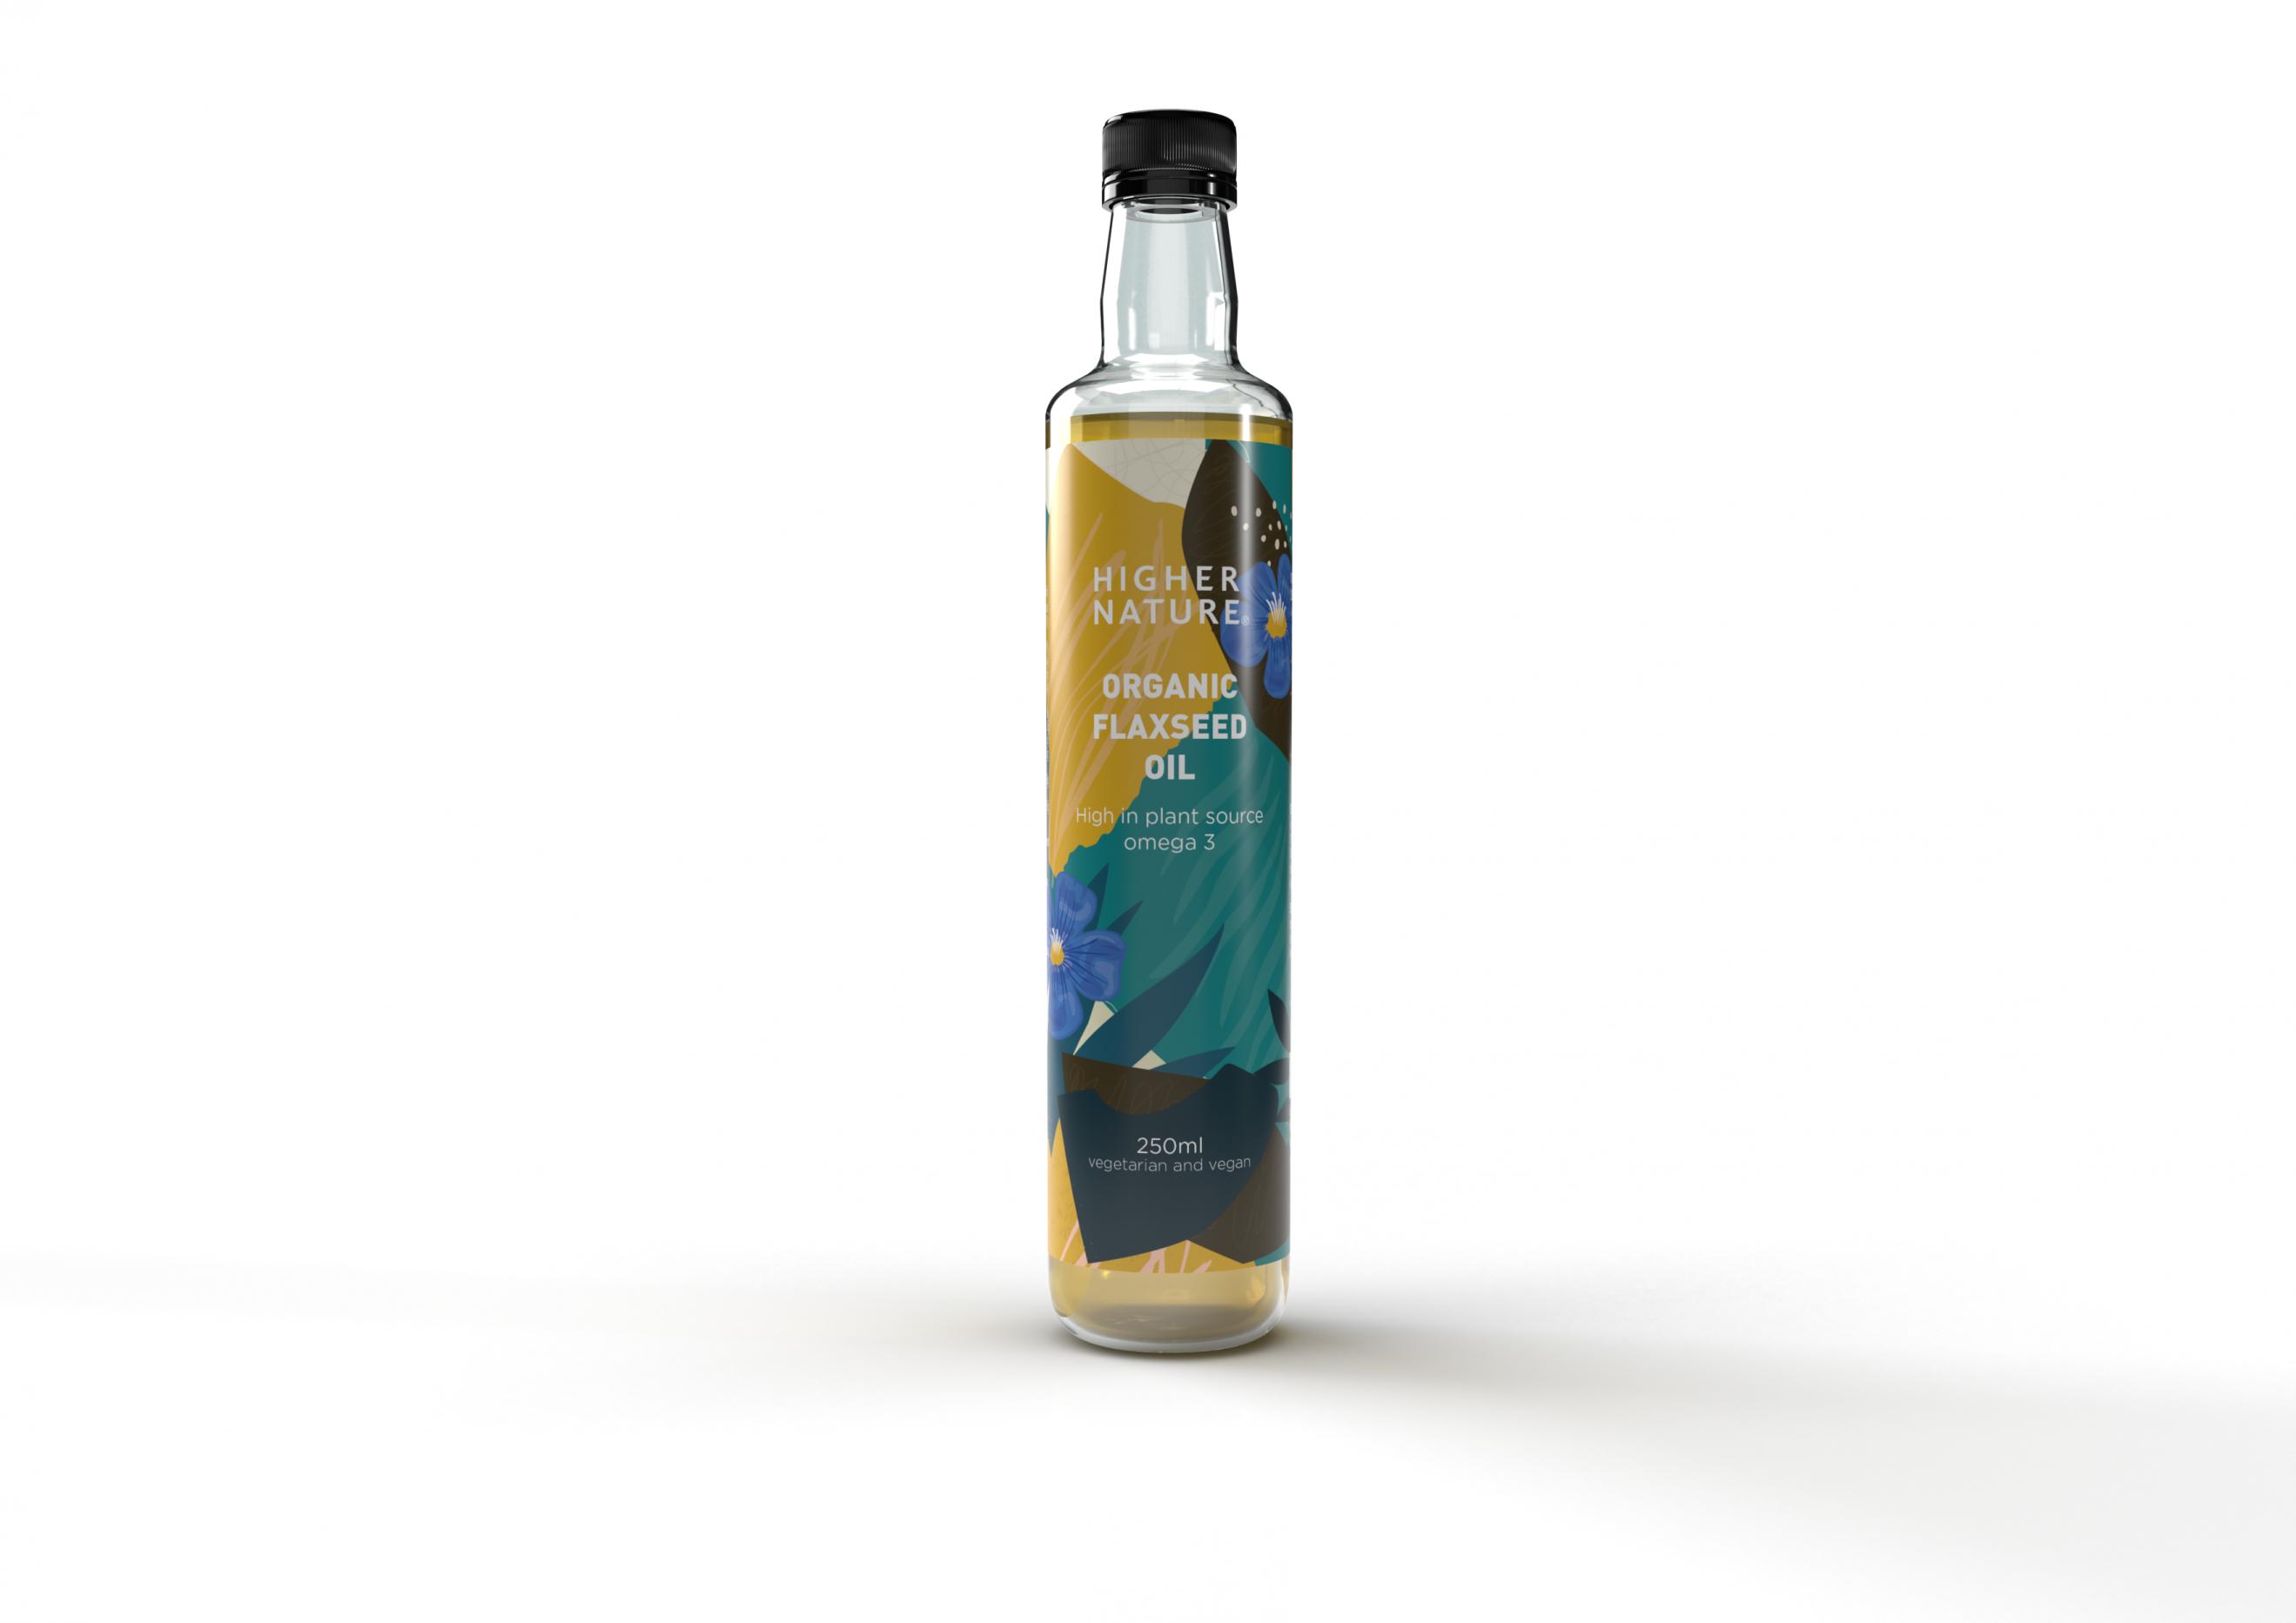 Organic Flaxseed Oil 250ml